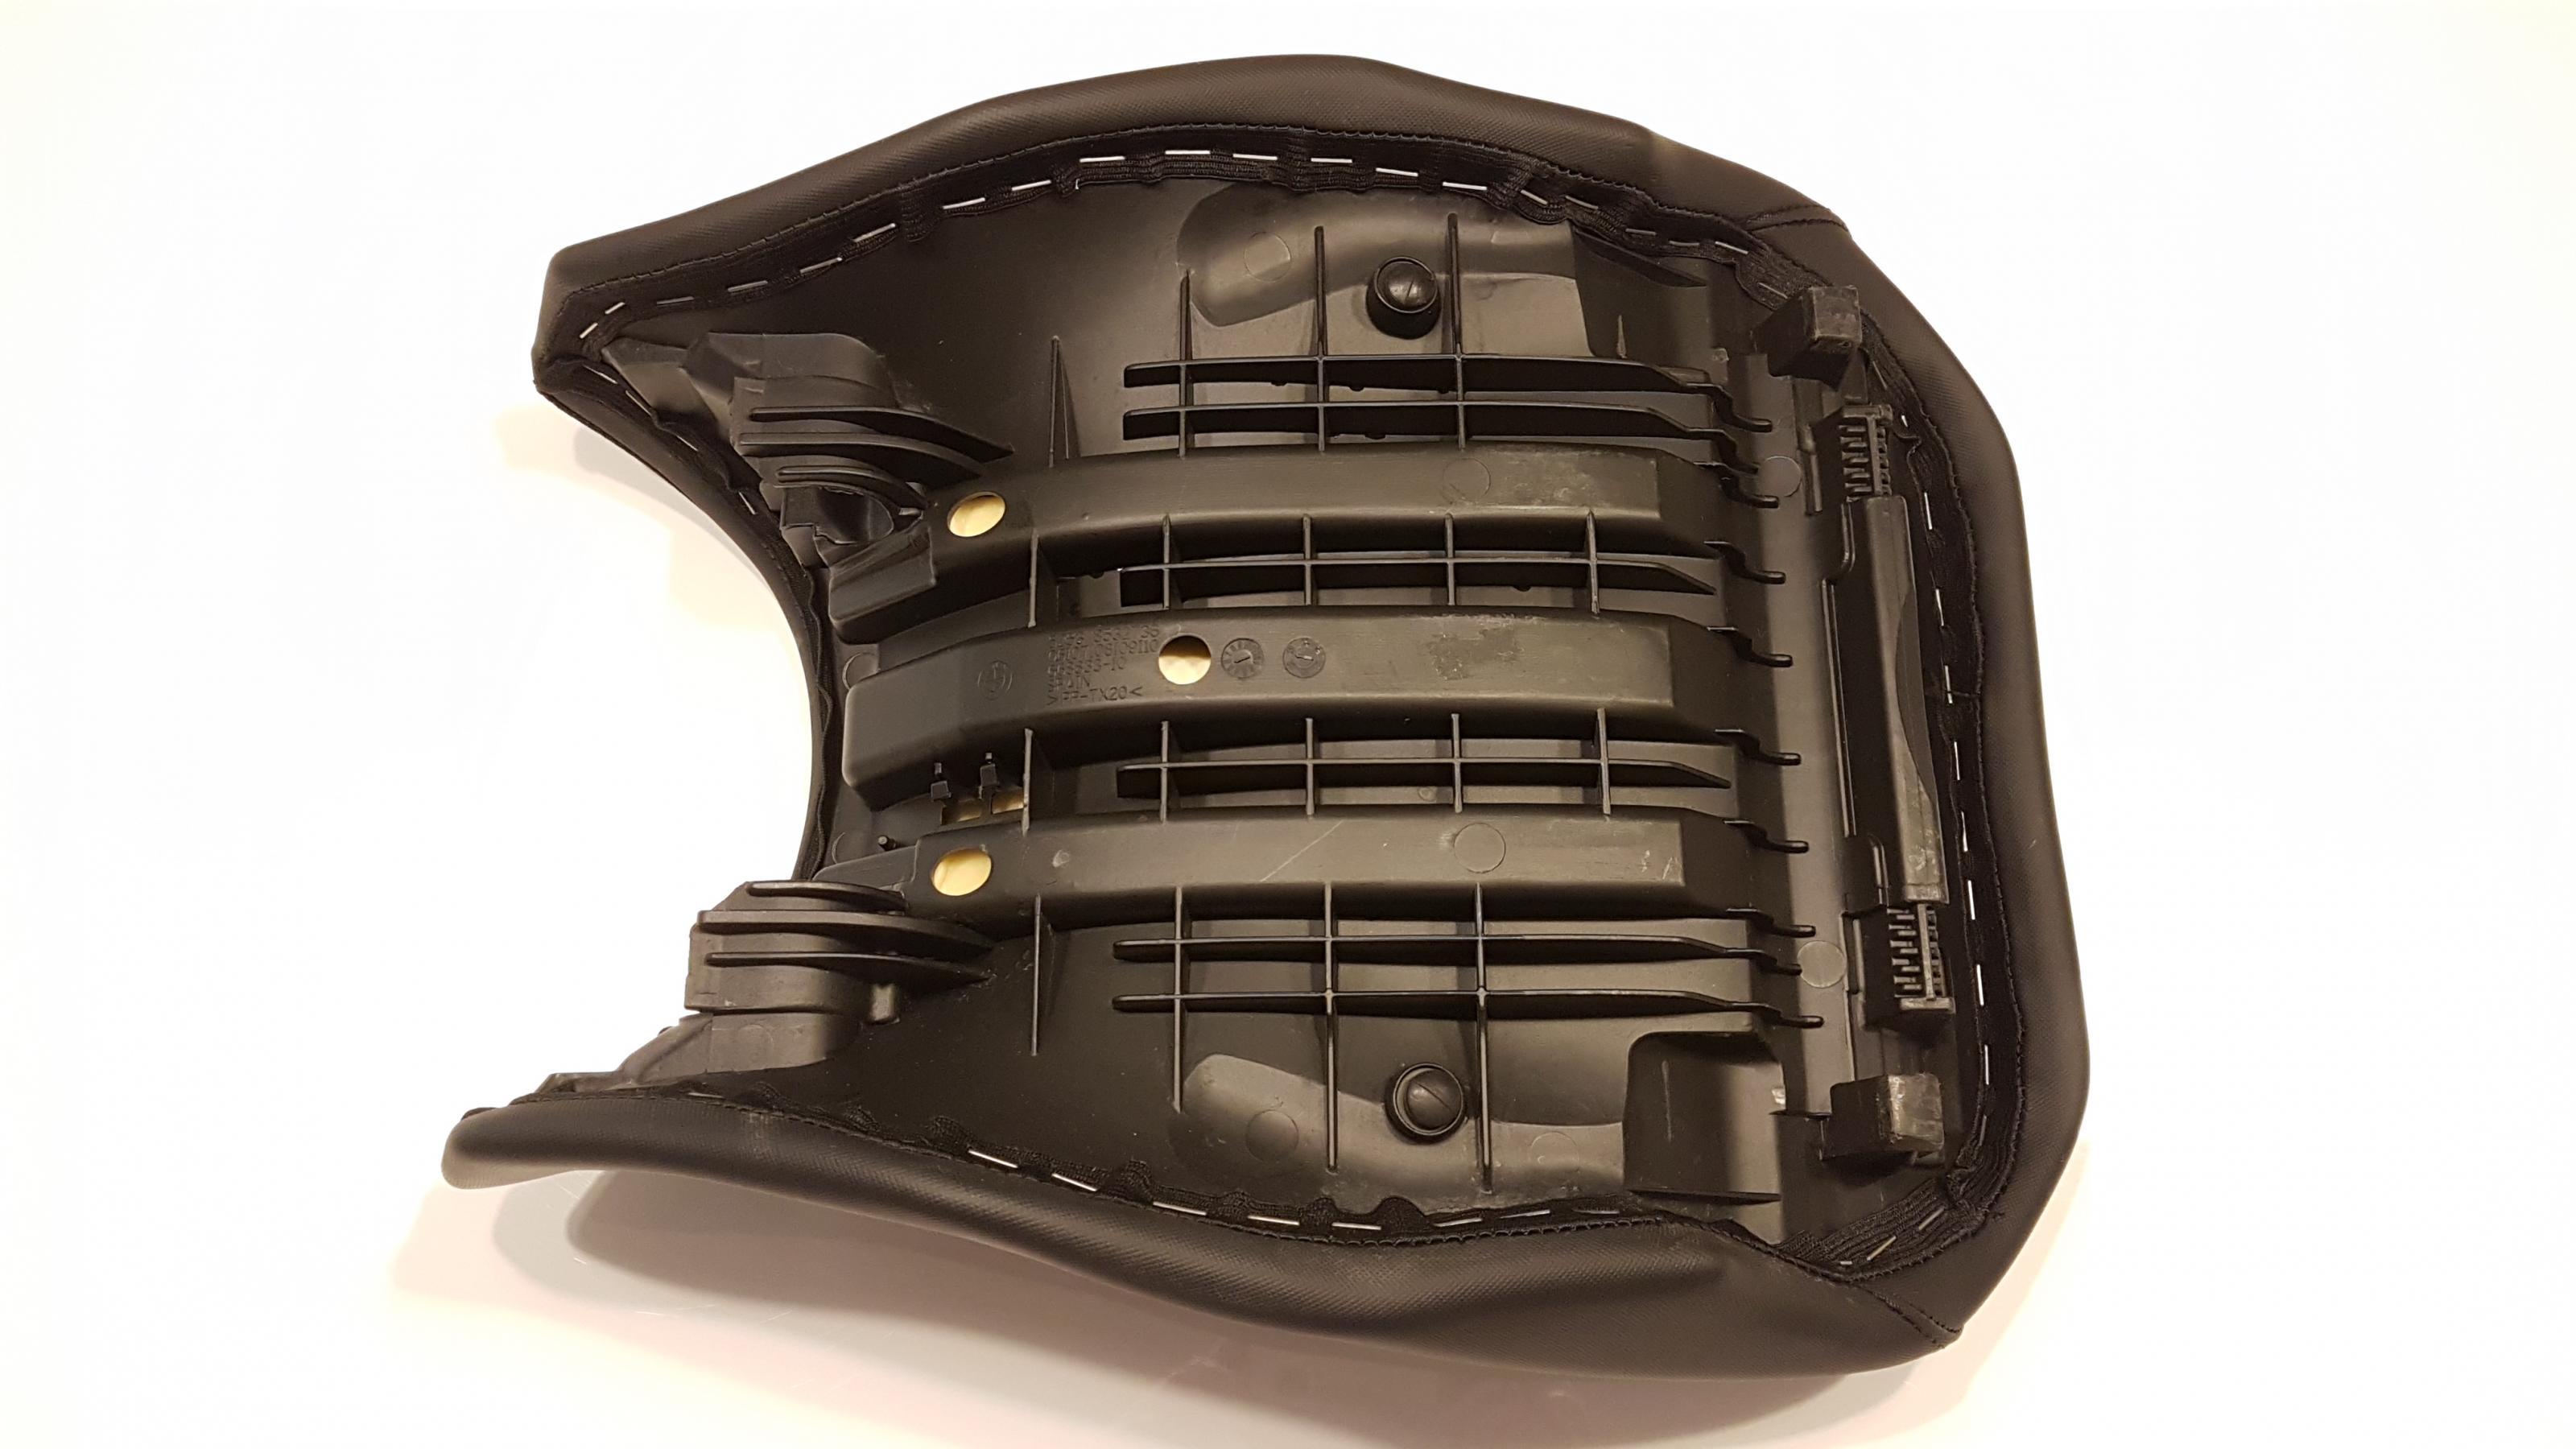 erledigt fahrersitz schwarz niedrig sitzh he 820 840 mm. Black Bedroom Furniture Sets. Home Design Ideas